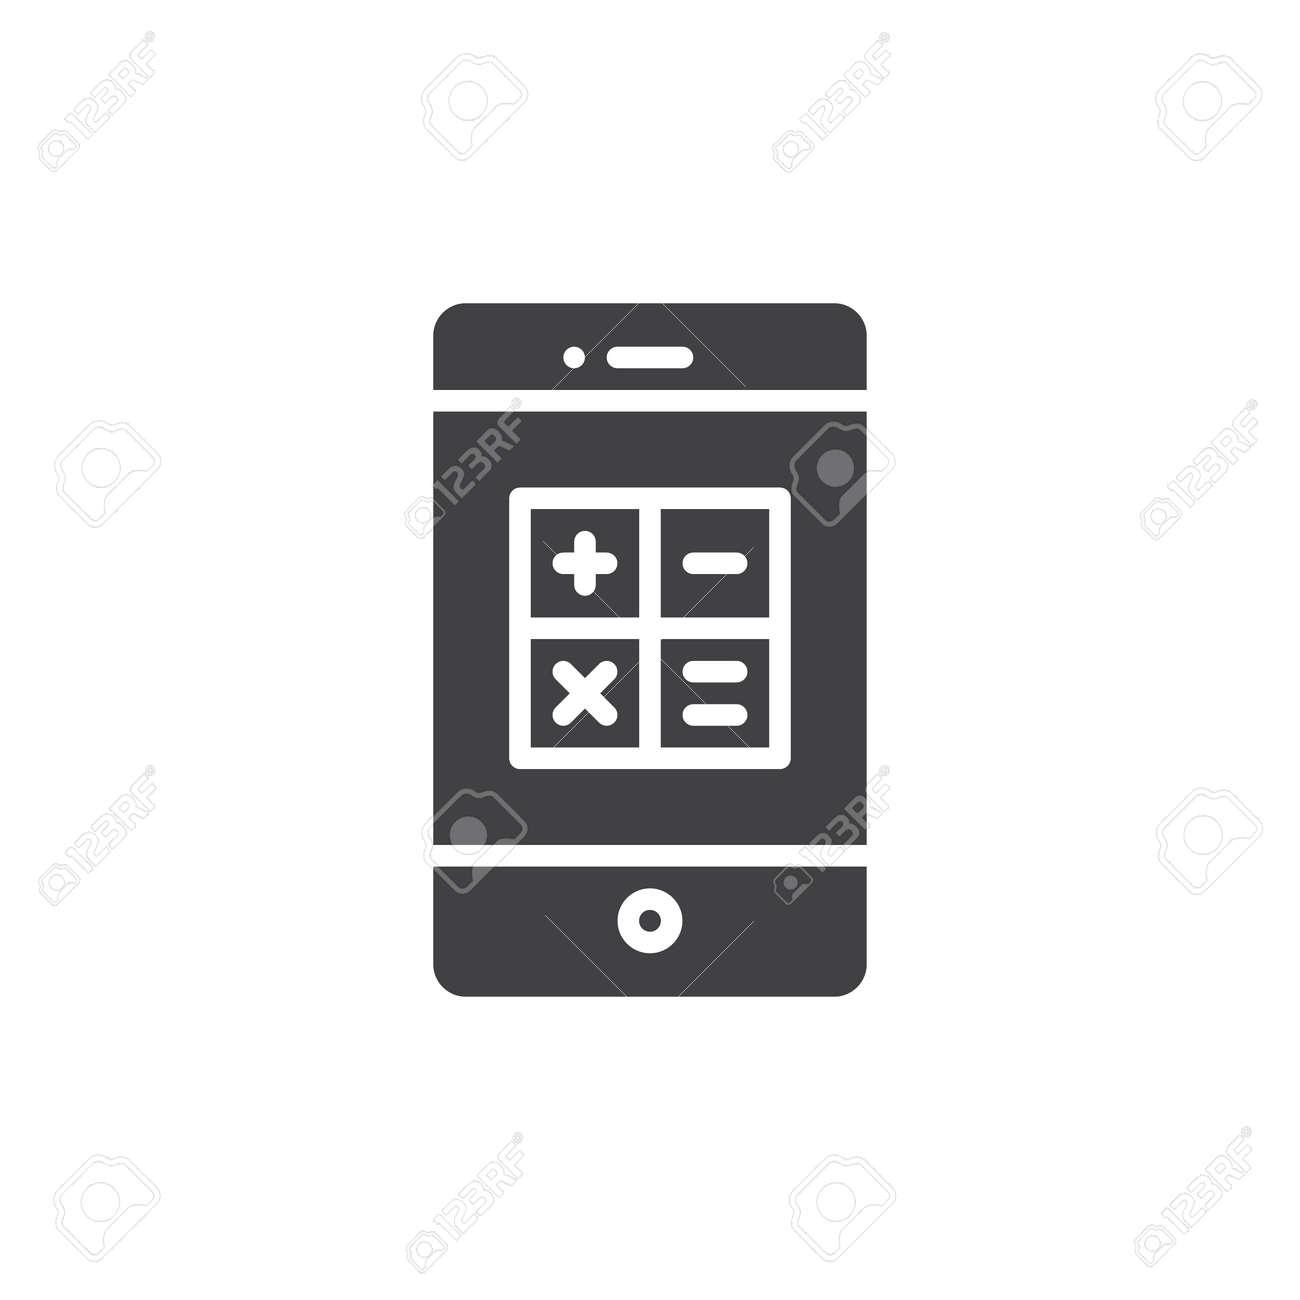 Smartphone with calculator icon